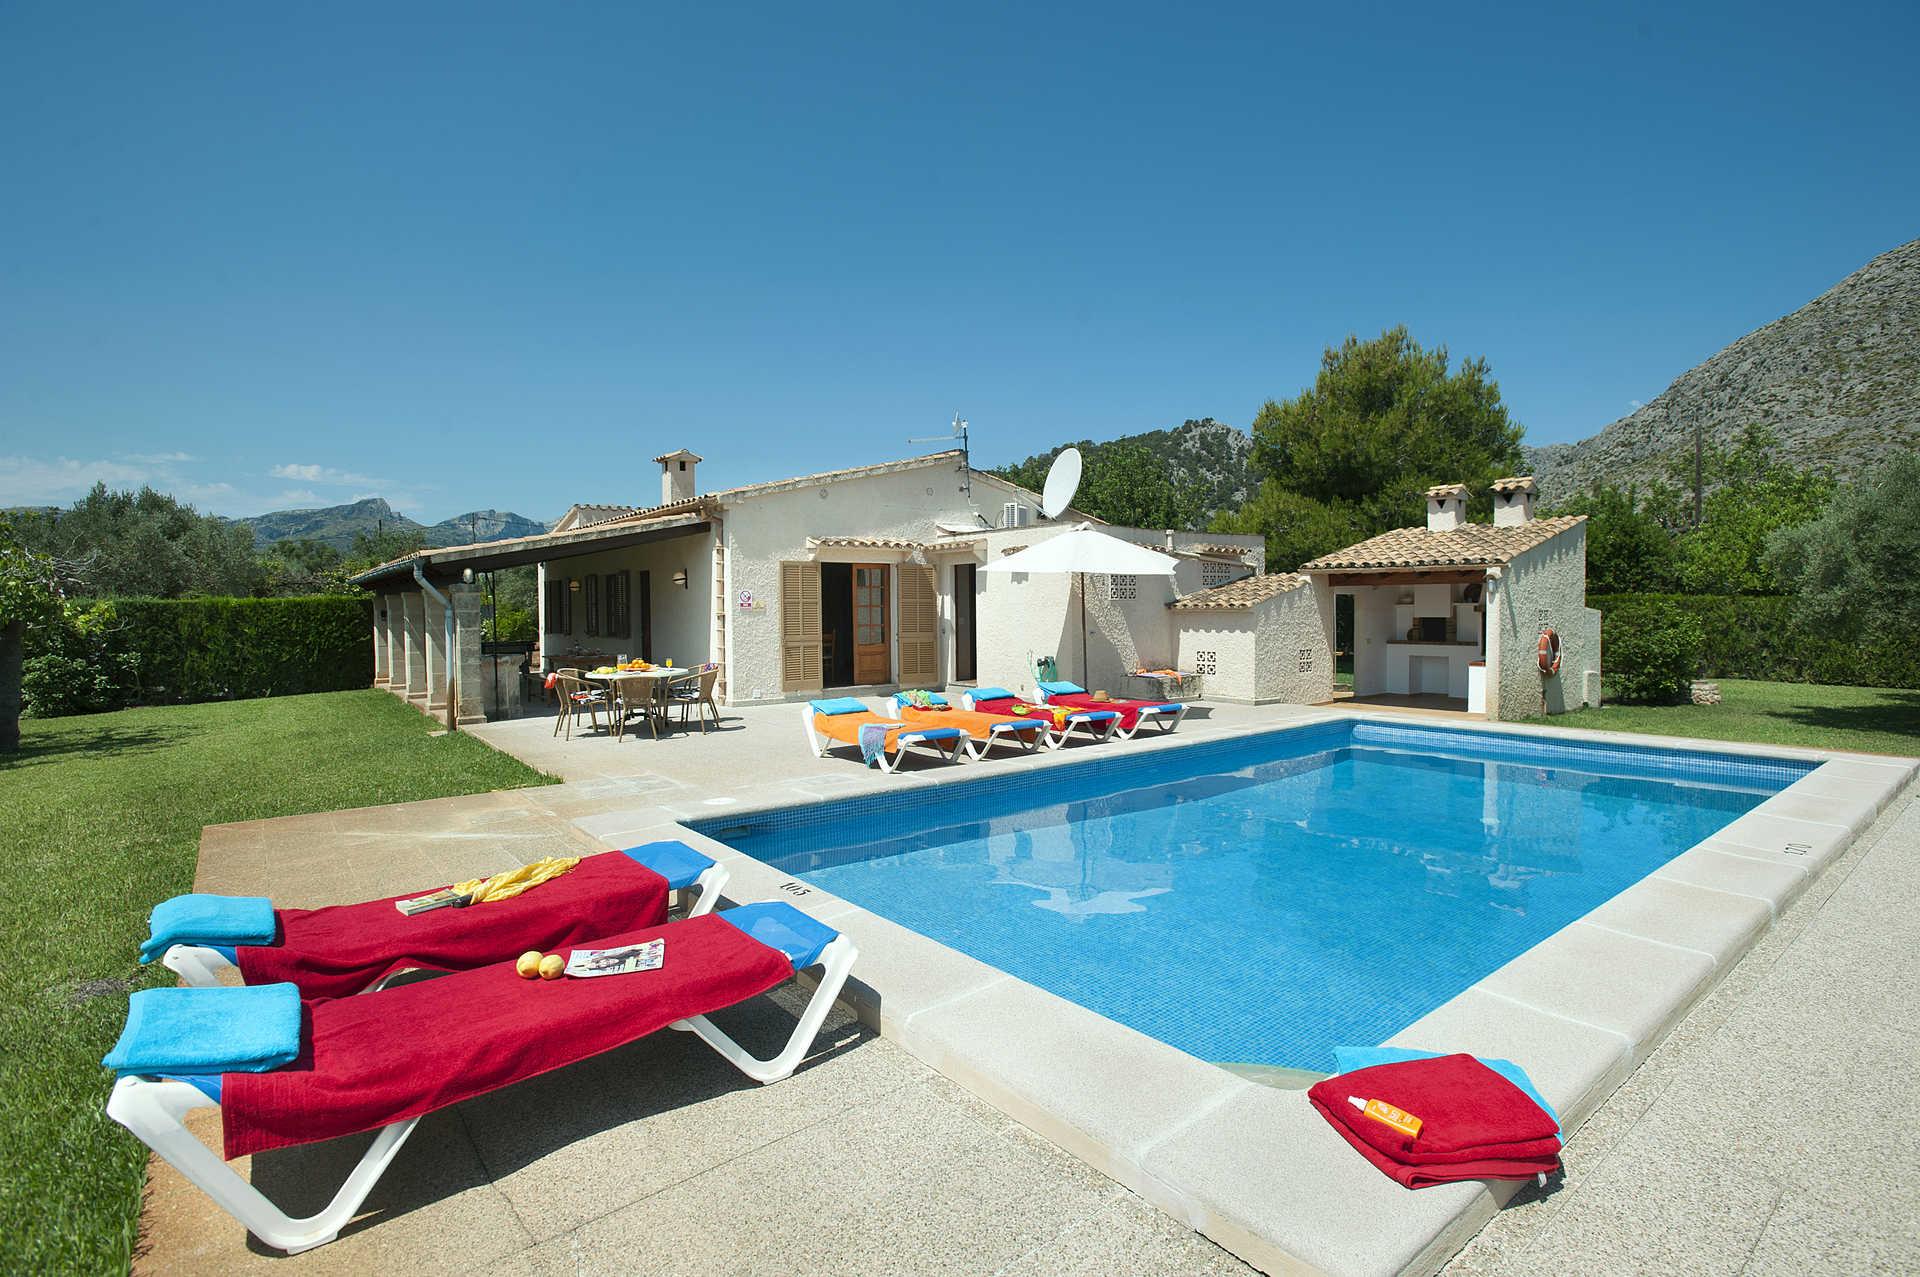 Villa Casa Margarita, Pollensa, Majorca, Spain